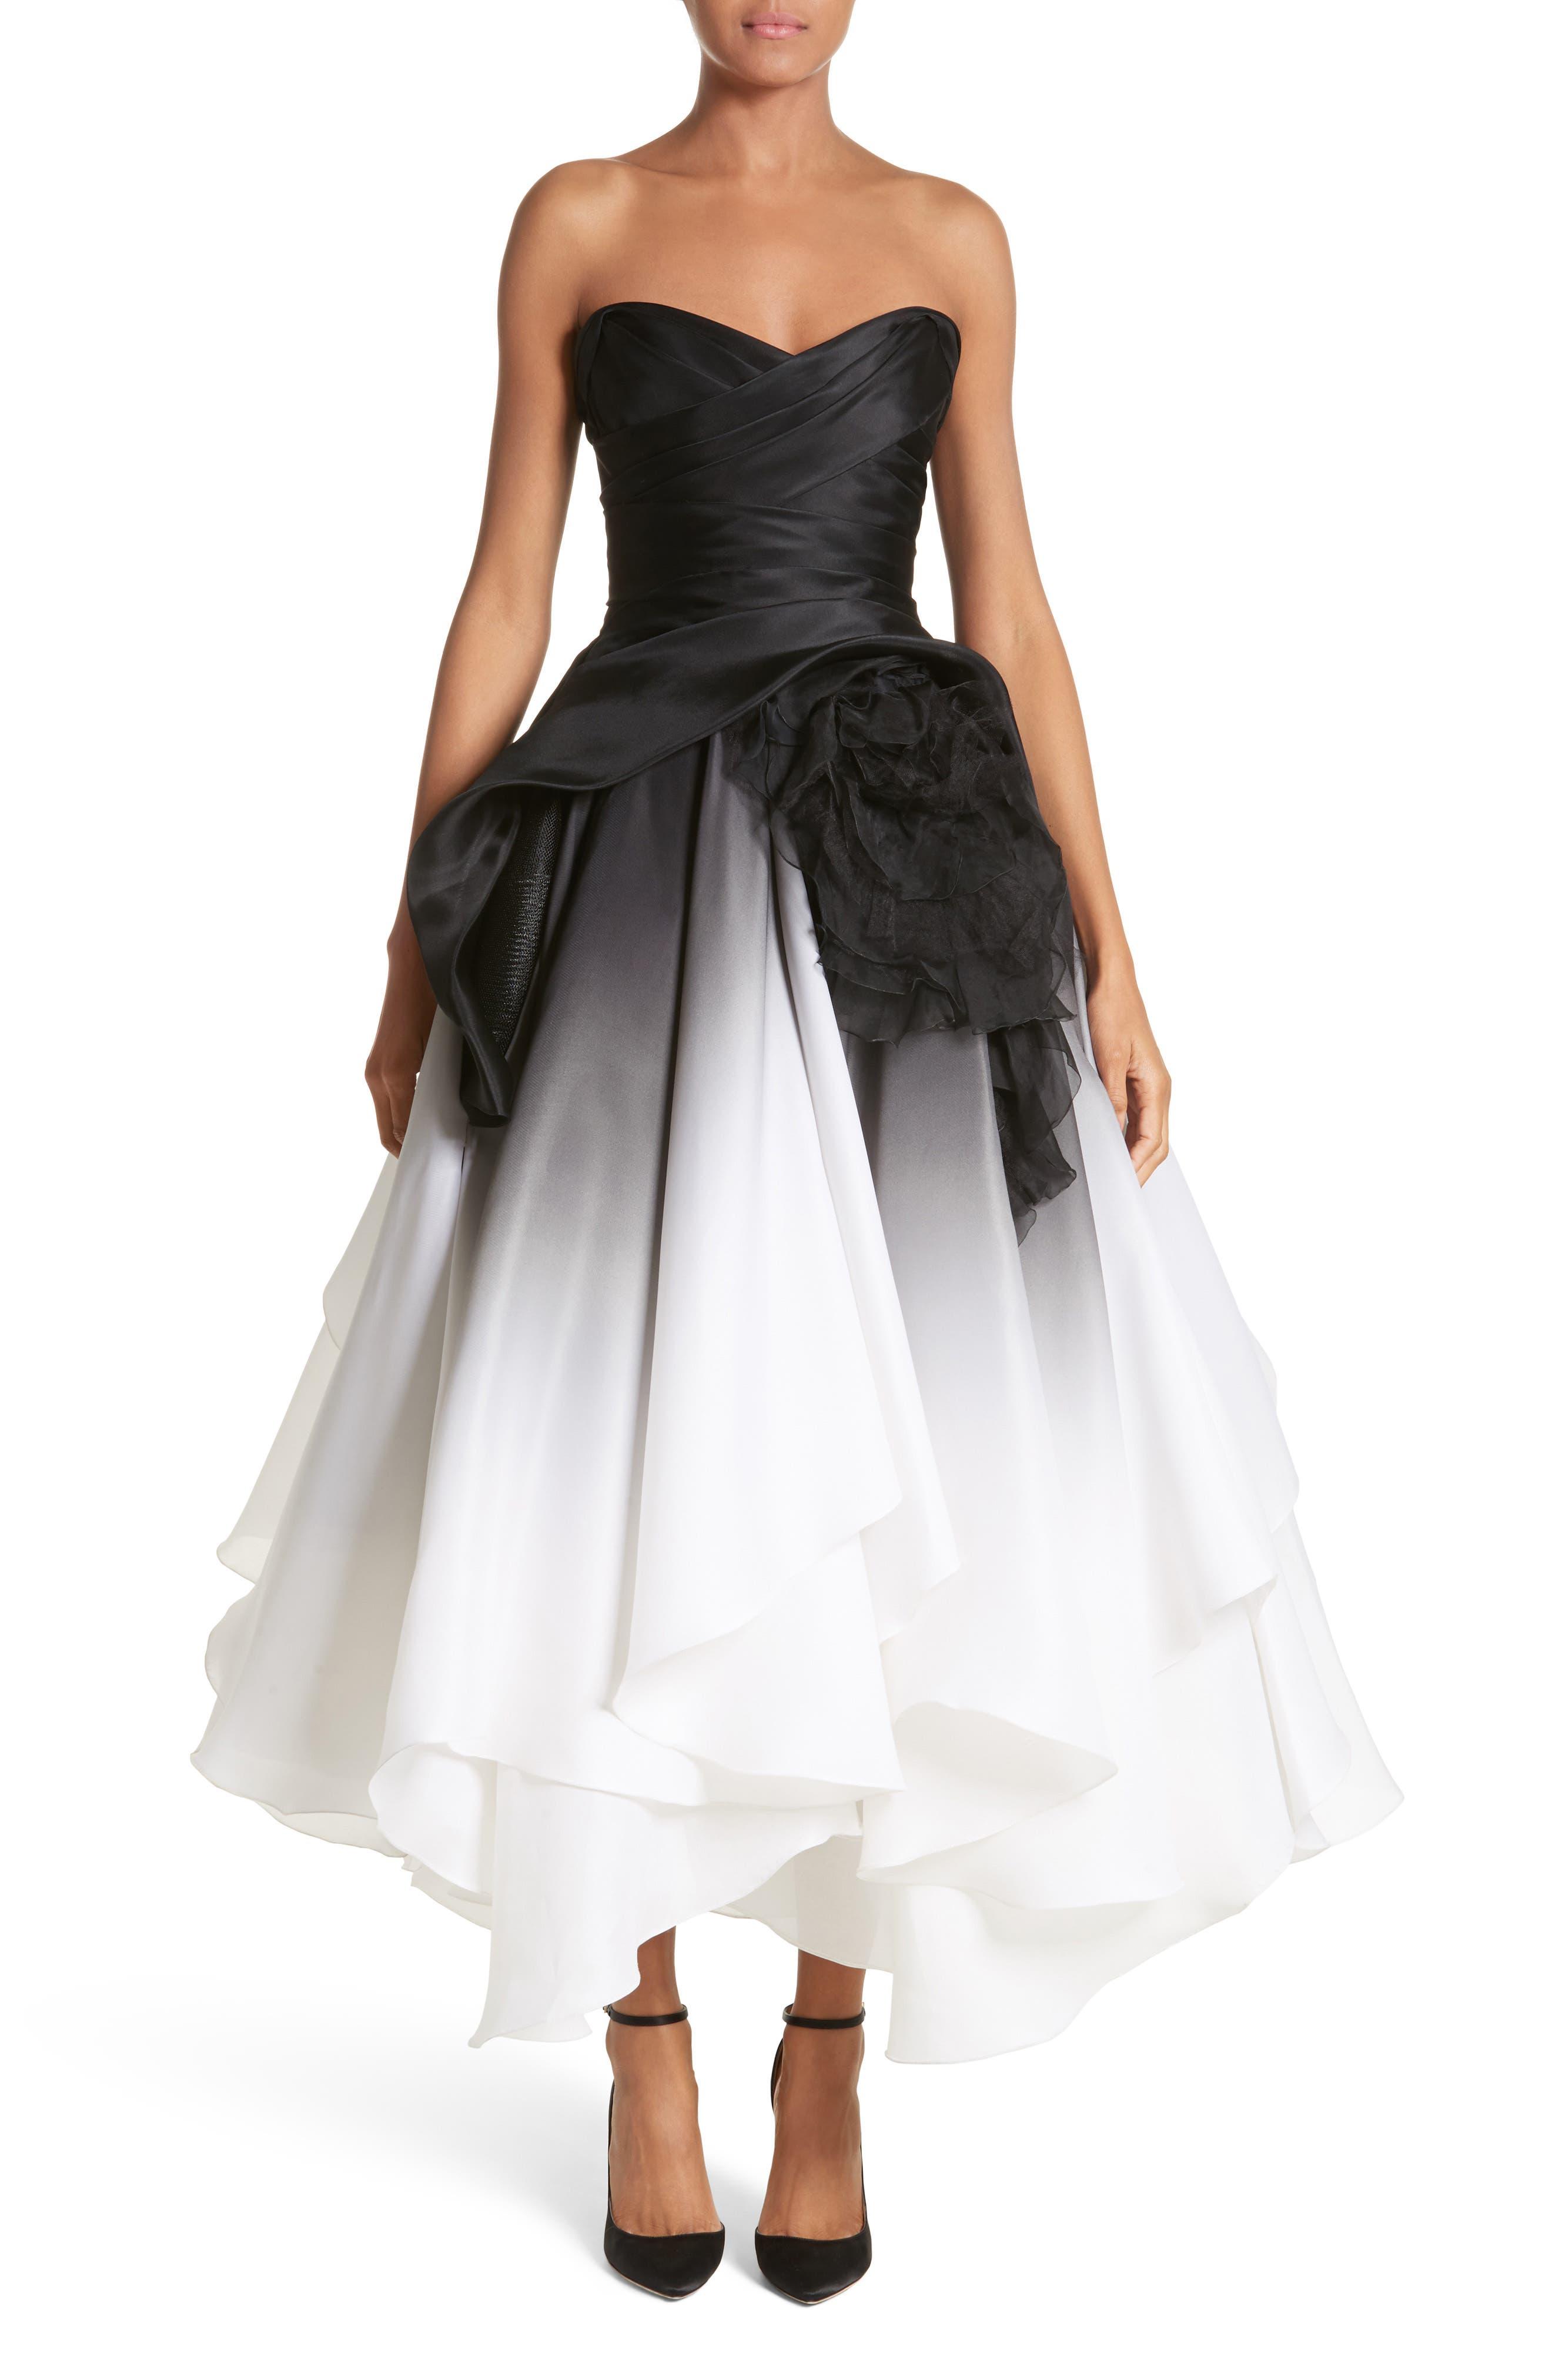 Ombré Strapless Tea Length Dress,                             Main thumbnail 1, color,                             001